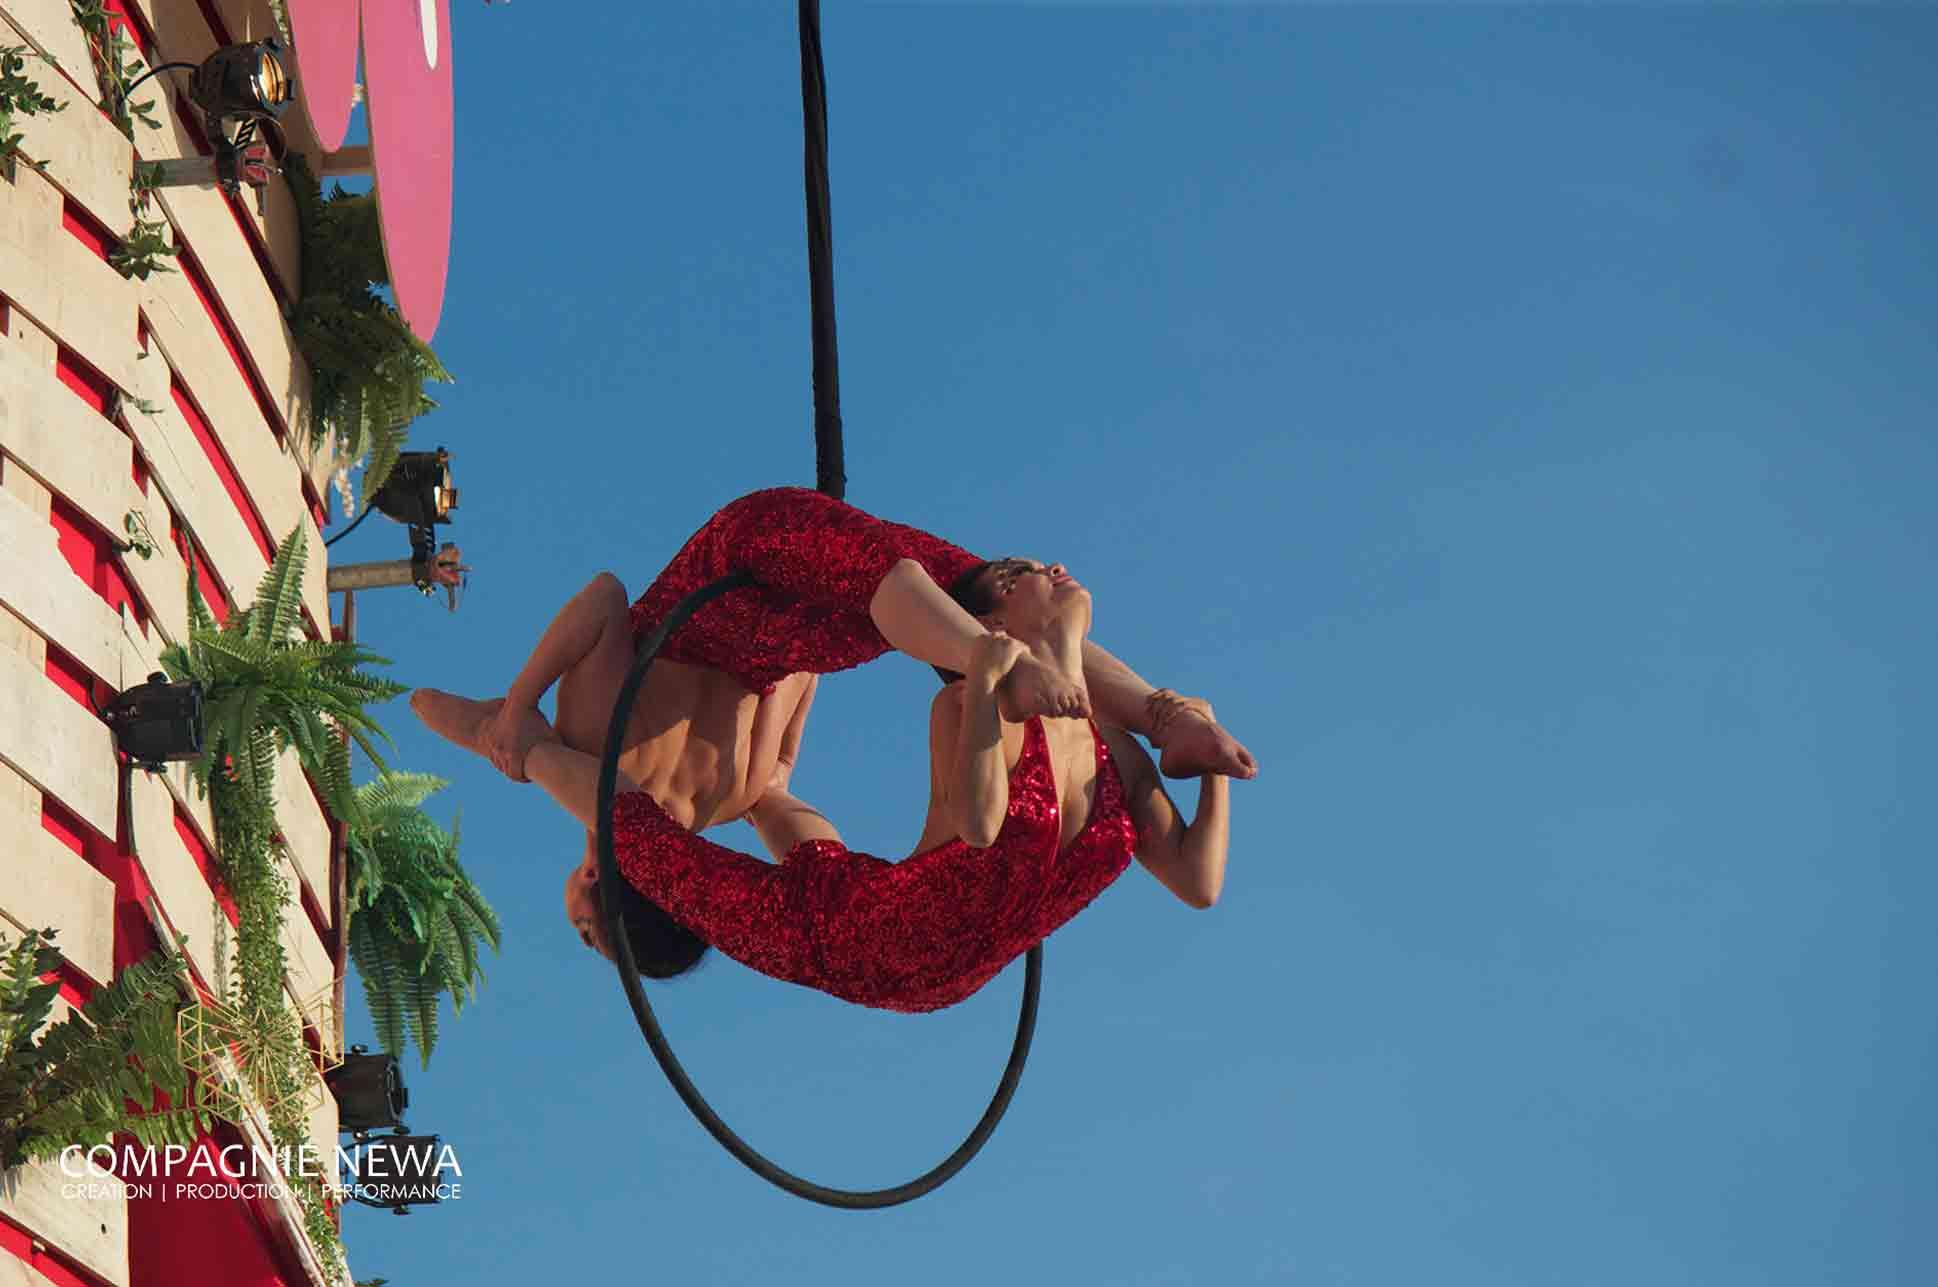 NEWA_duo_hoop_aerials_amsterdam_festival